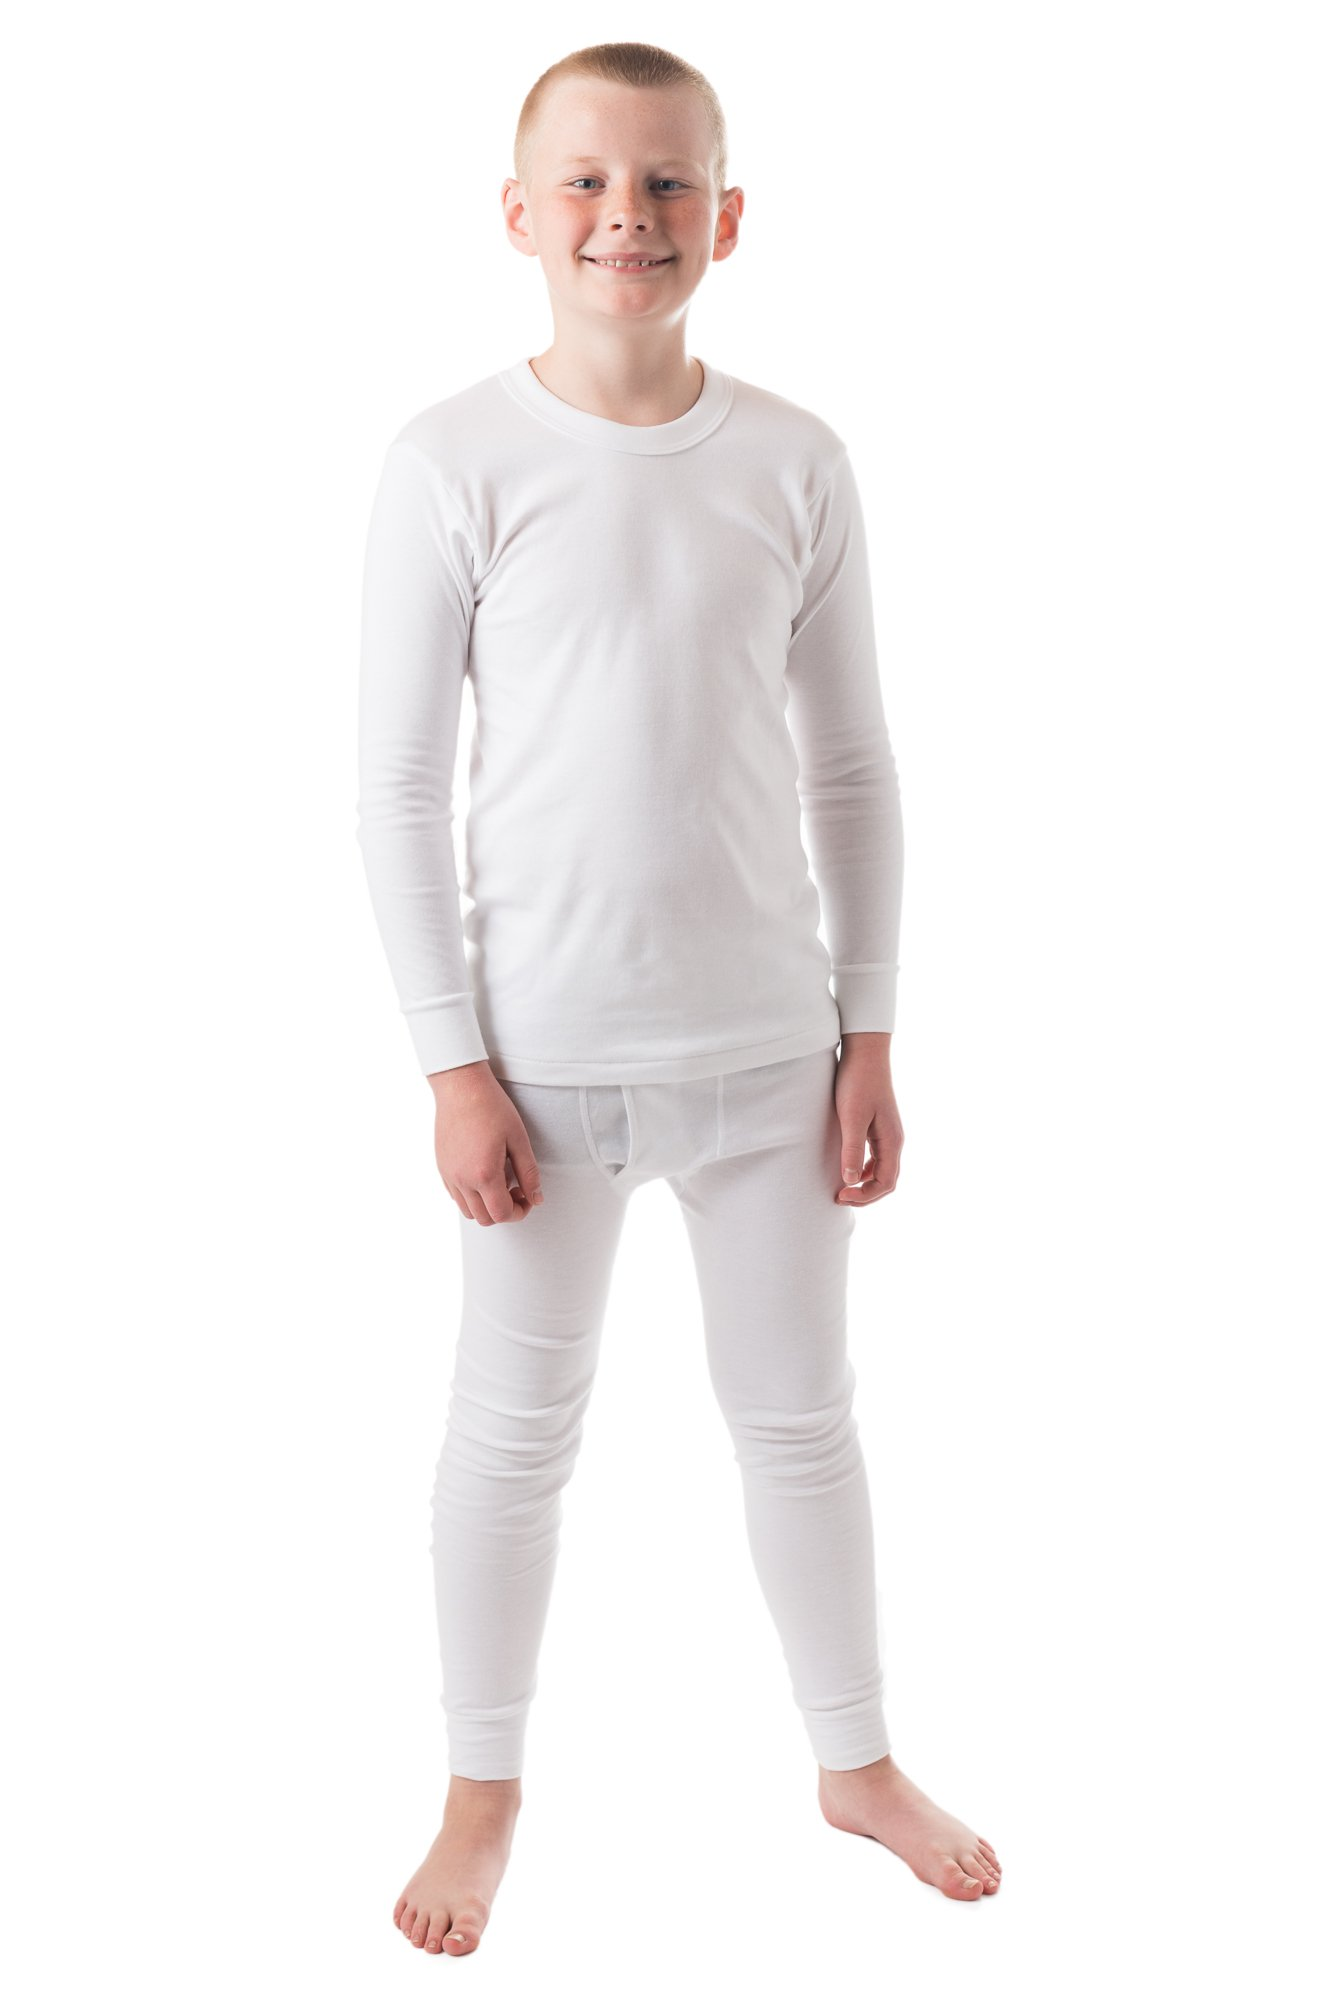 Boy's Round Neck Long Sleeve Top & Bottom 100% Cotton Thermal Underwar (Large, White)